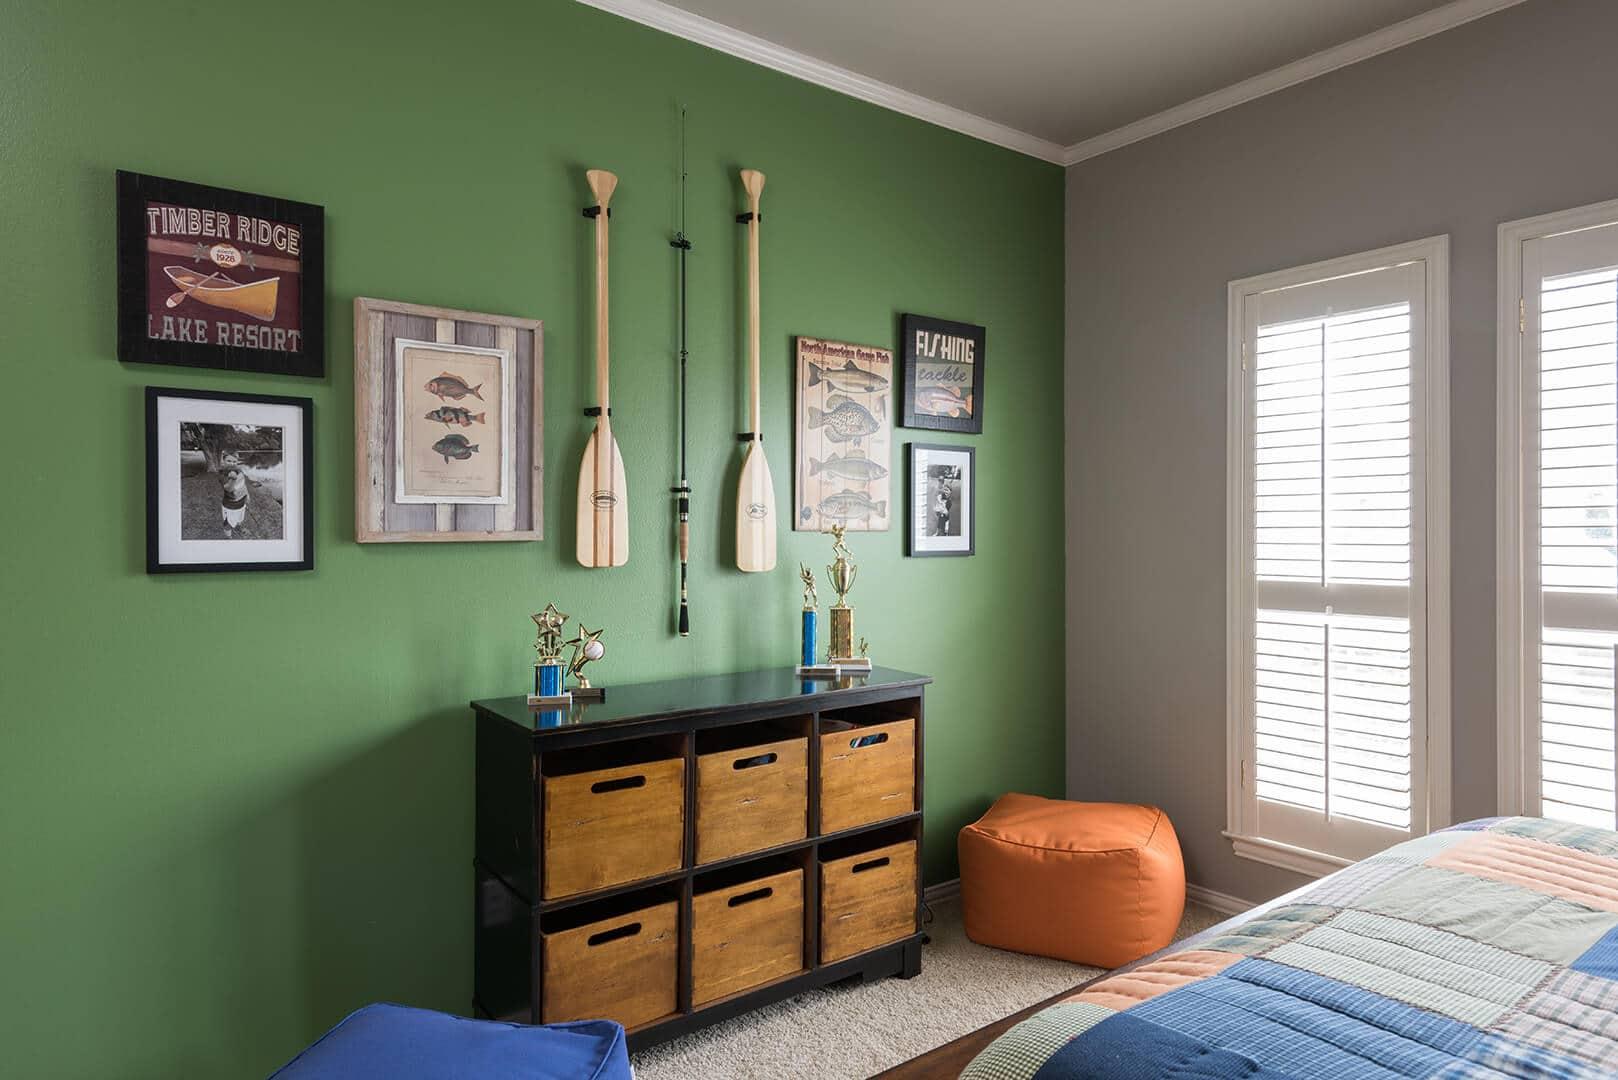 Green & Plaid Boys Lake Room Decorating Ideas | Dallas Interior Decorator, r by Dee Frazier Interiors Decorating Den Interiors the best Dallas Interior Designer